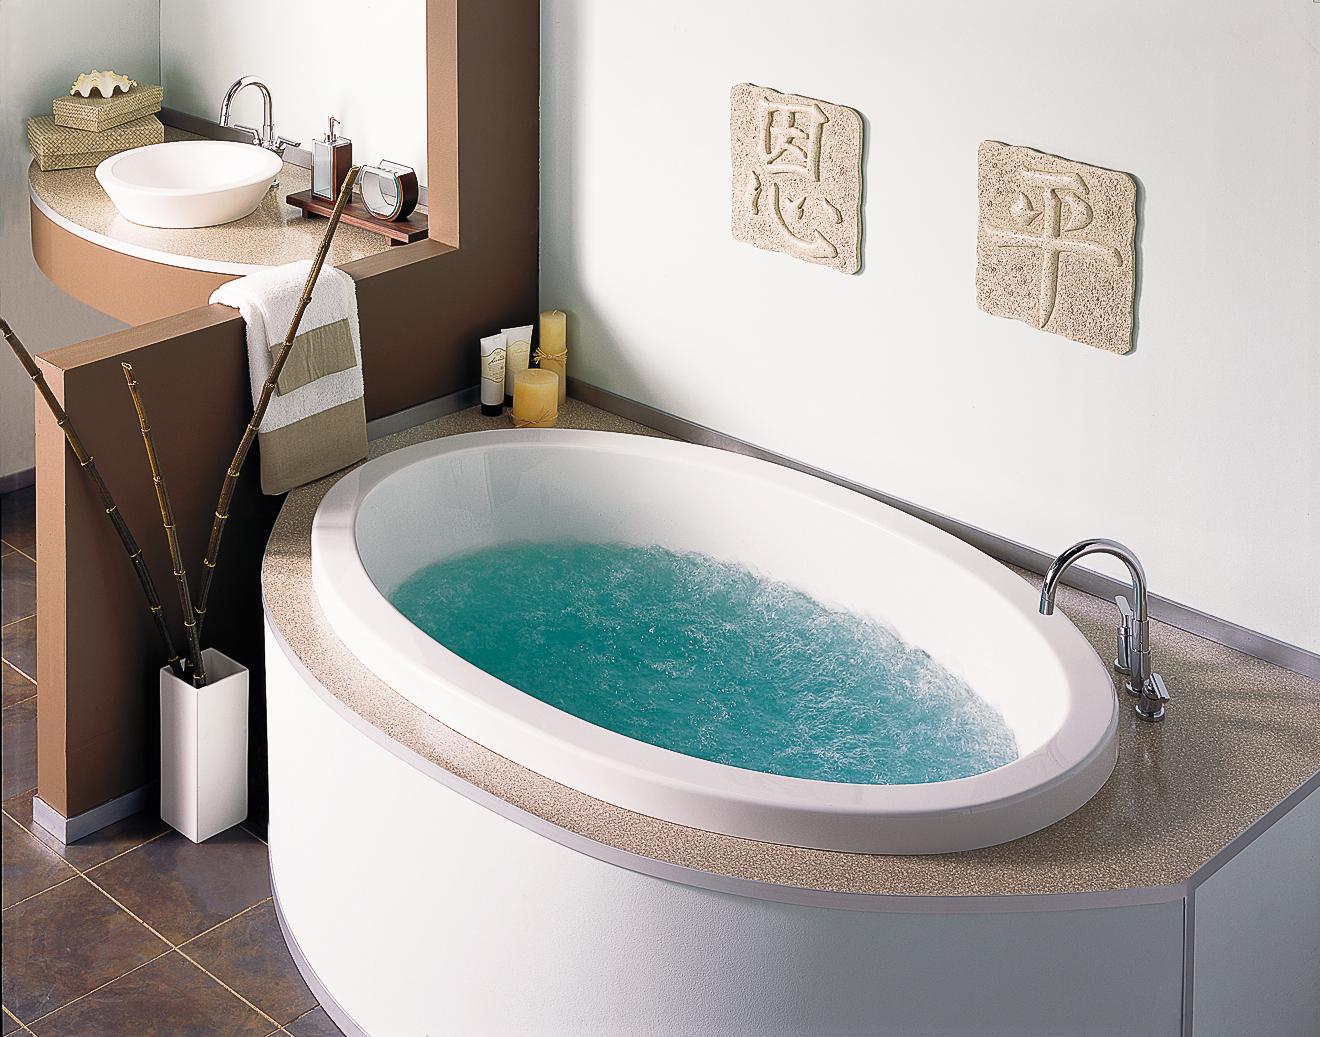 Great Shower & Bathtub Designs - Sunset - Sunset Magazine